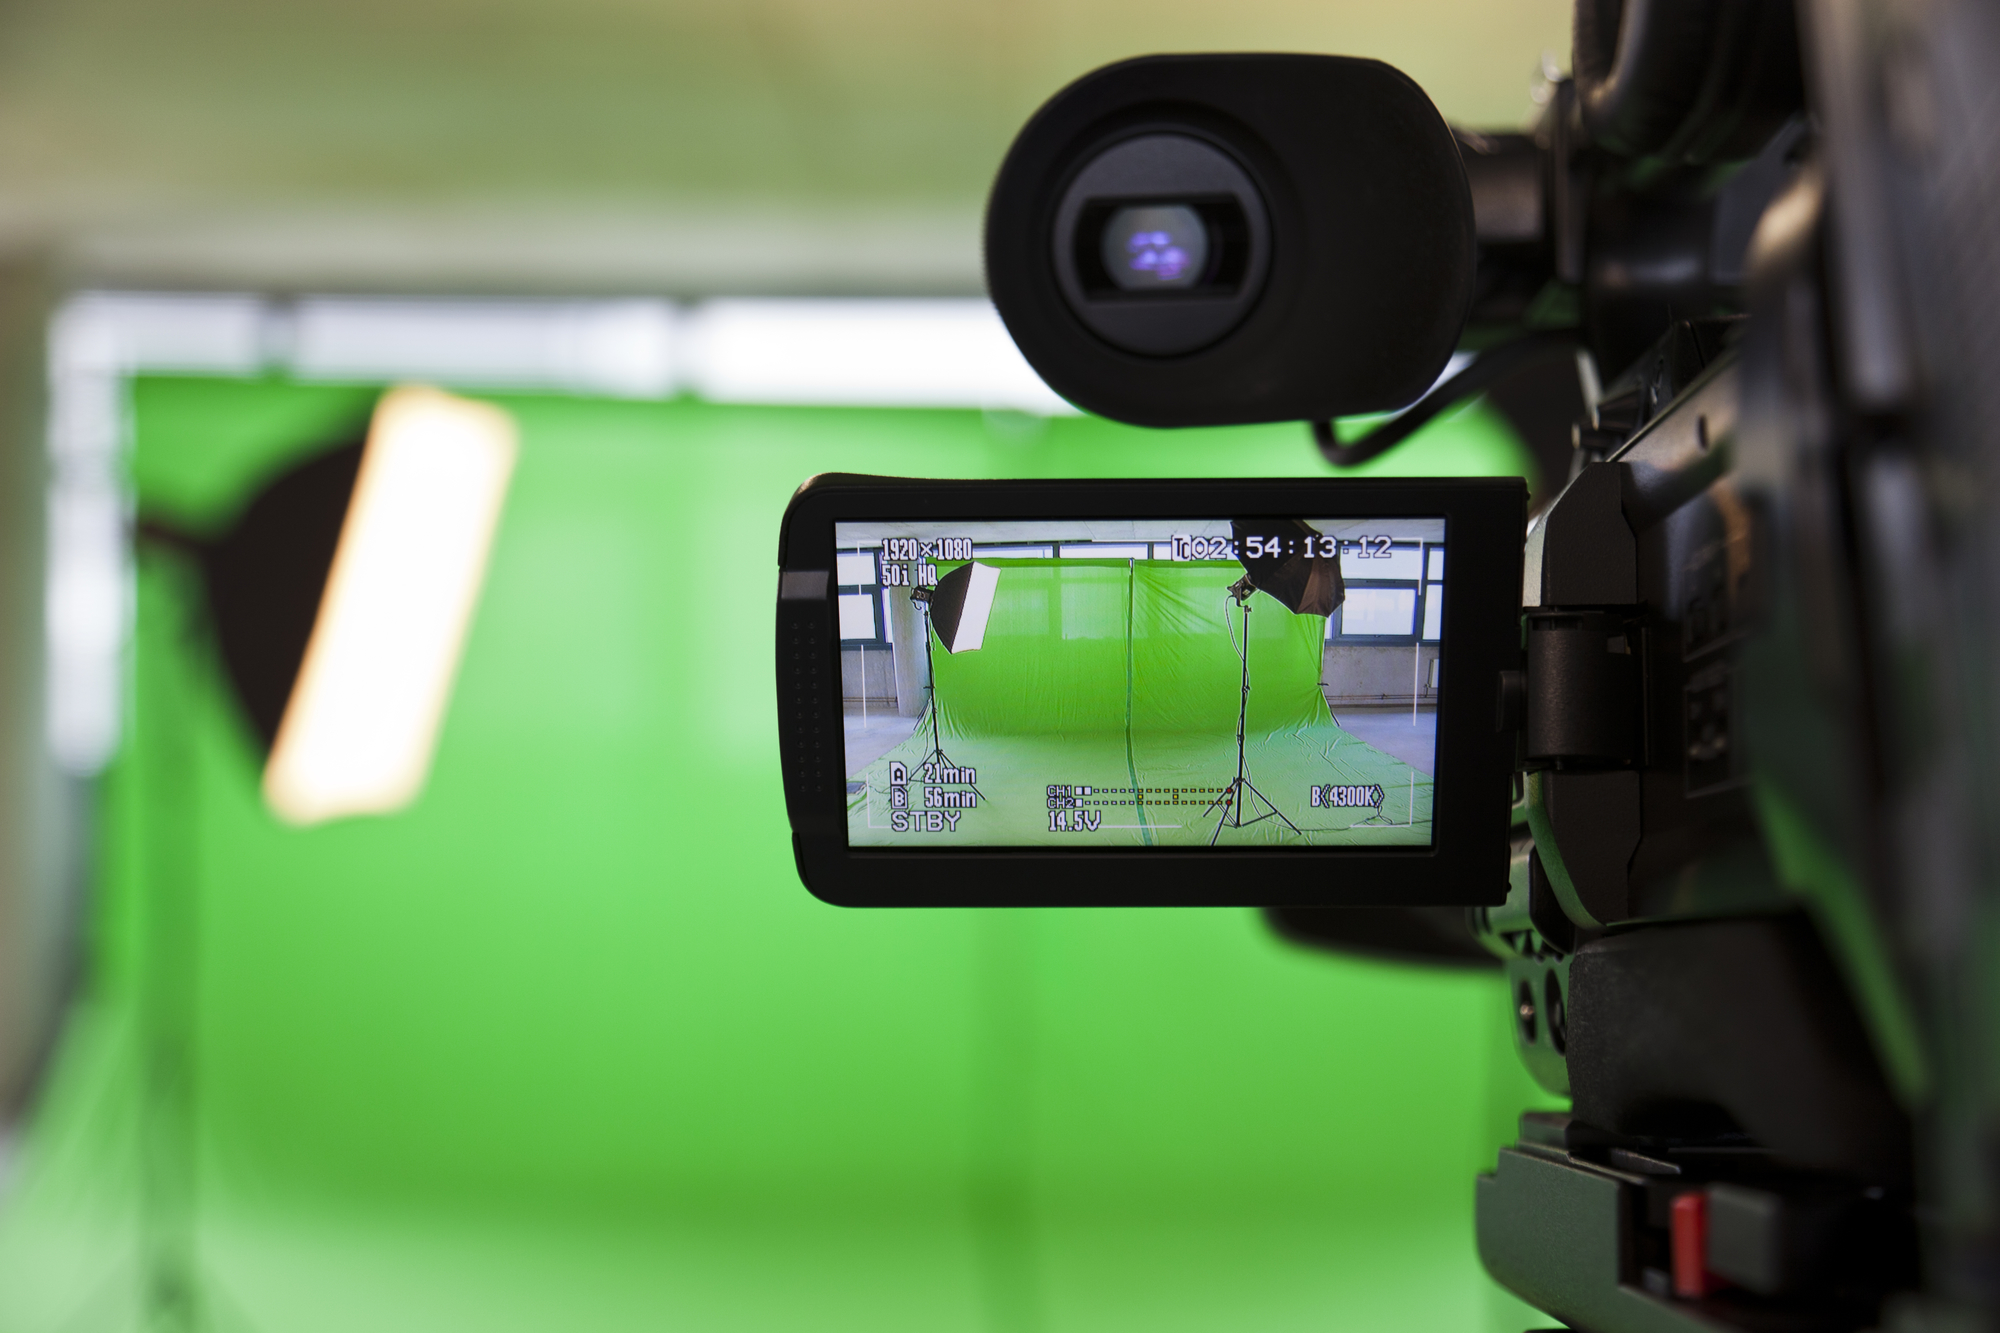 Viewfinder of video camera looking at green screen set